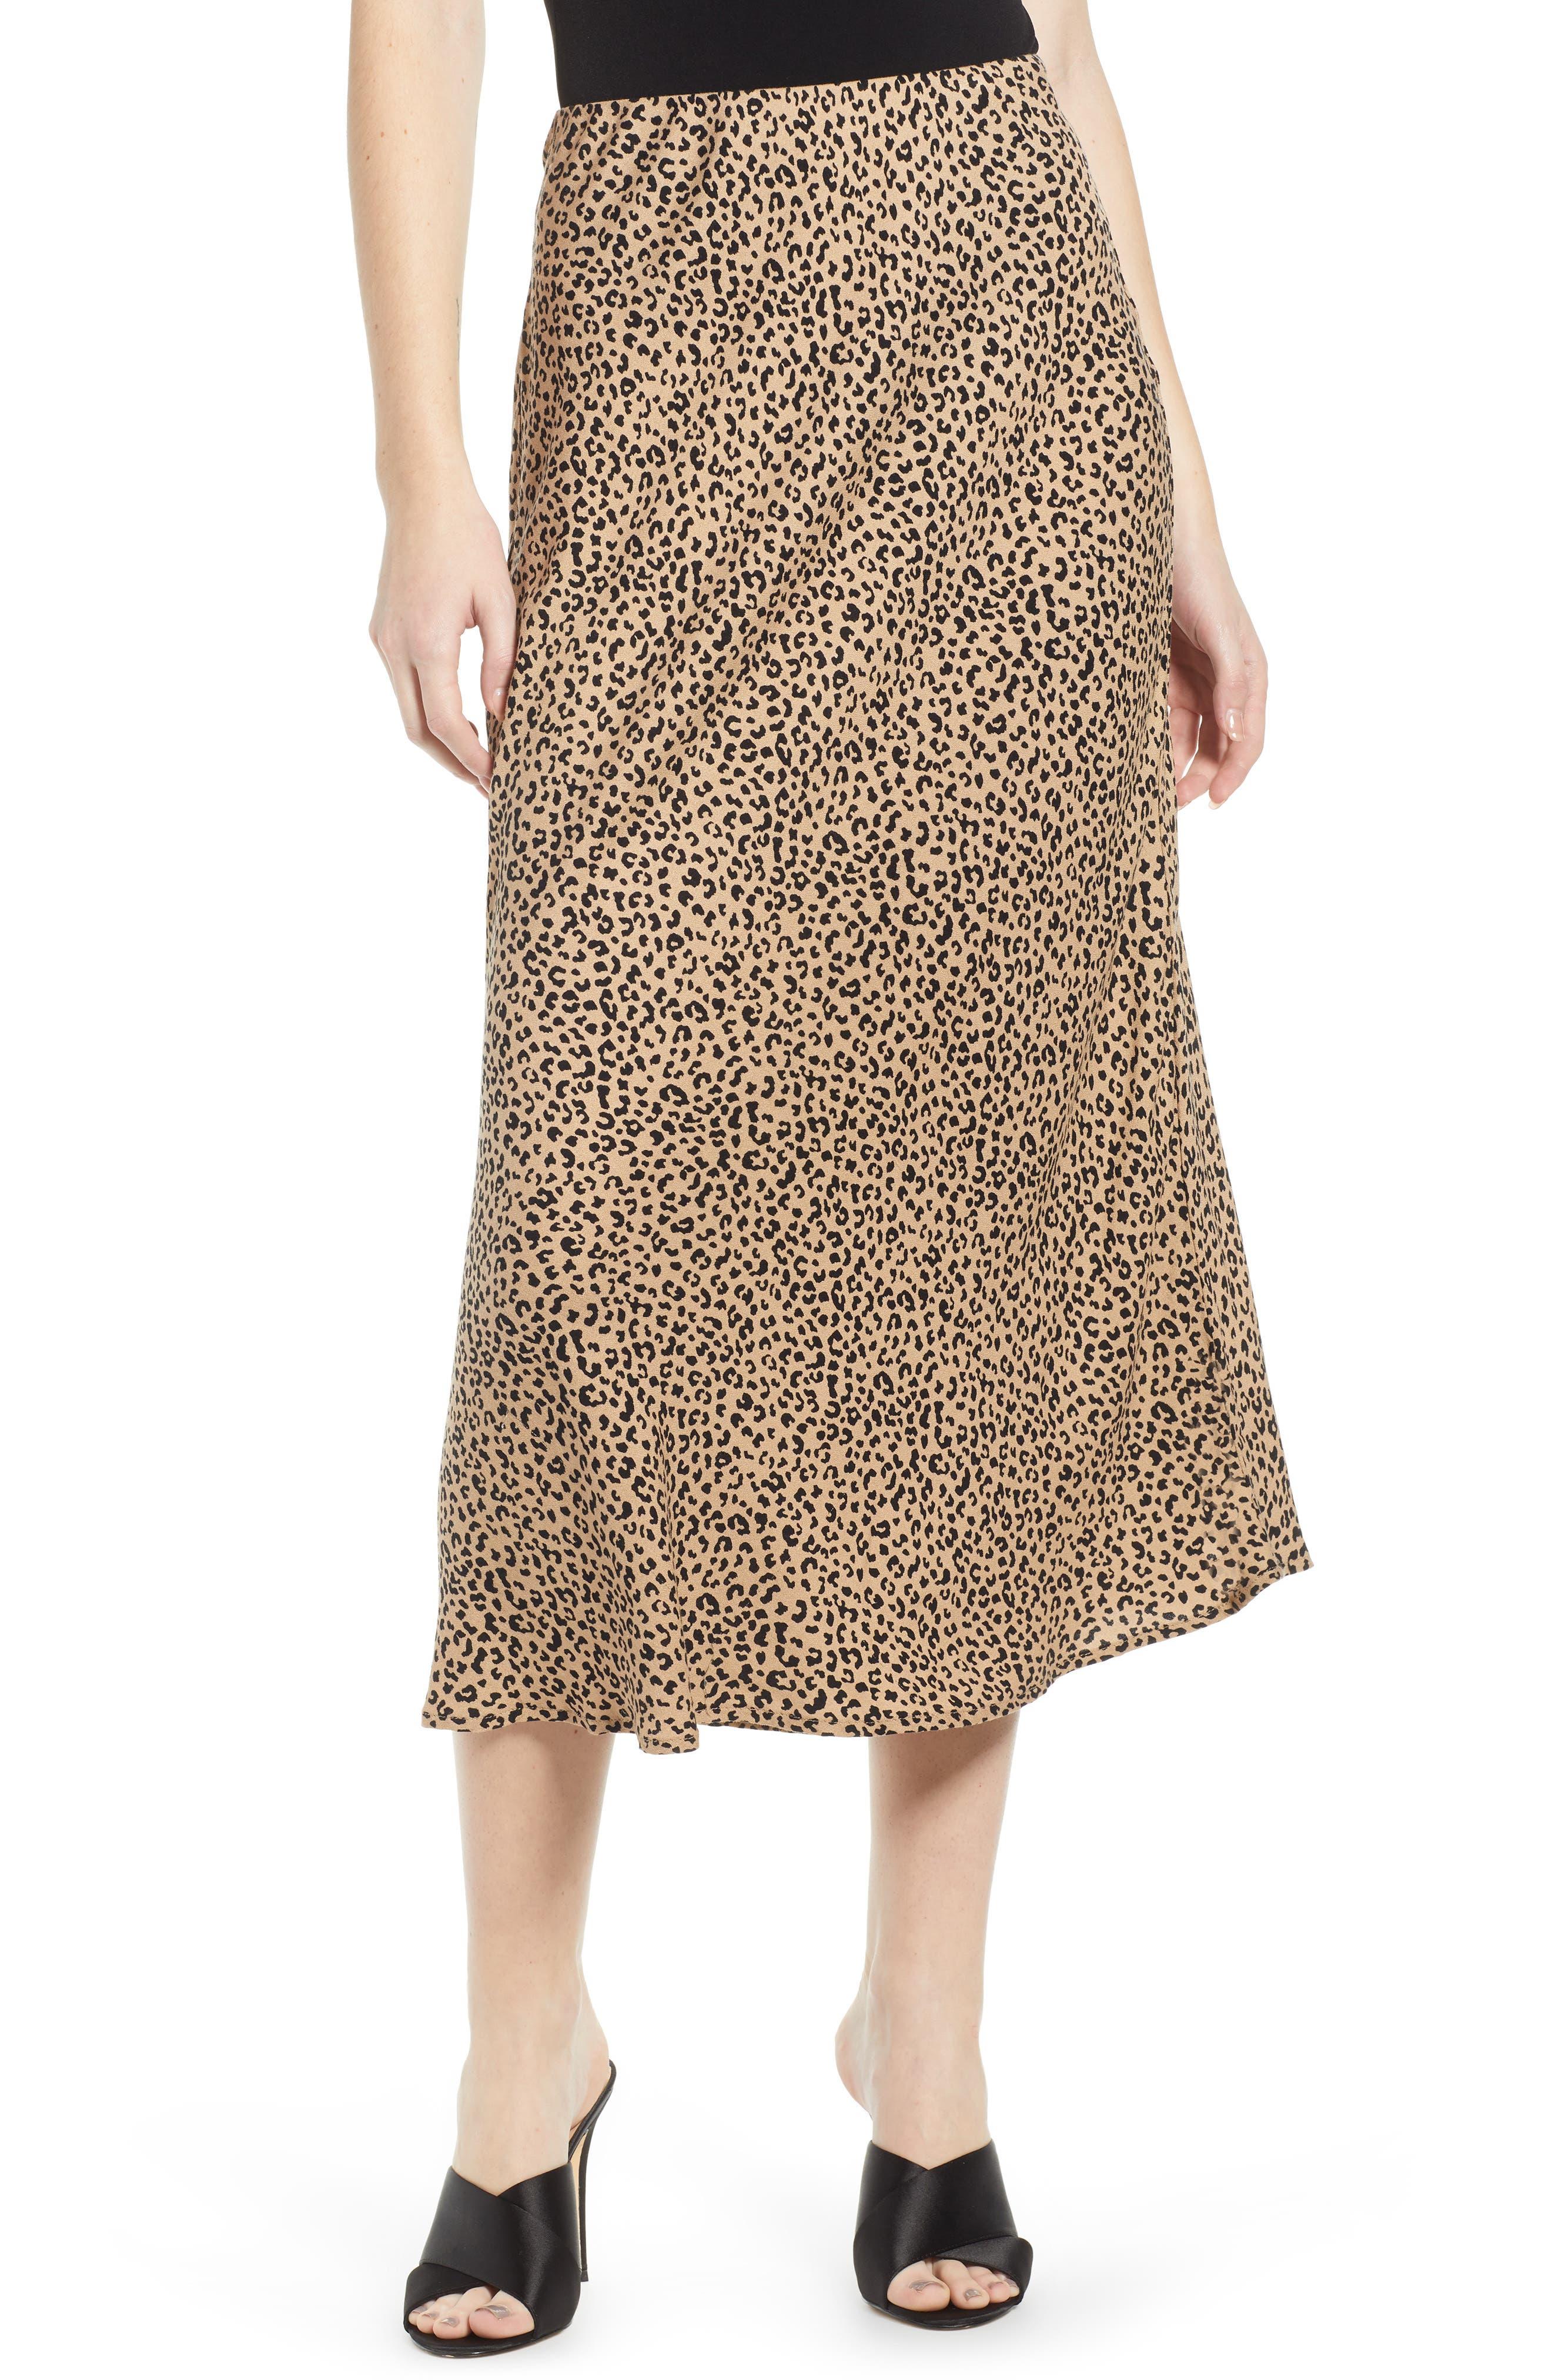 LOVE, FIRE Leopard Midi Skirt, Main, color, LEOPARD